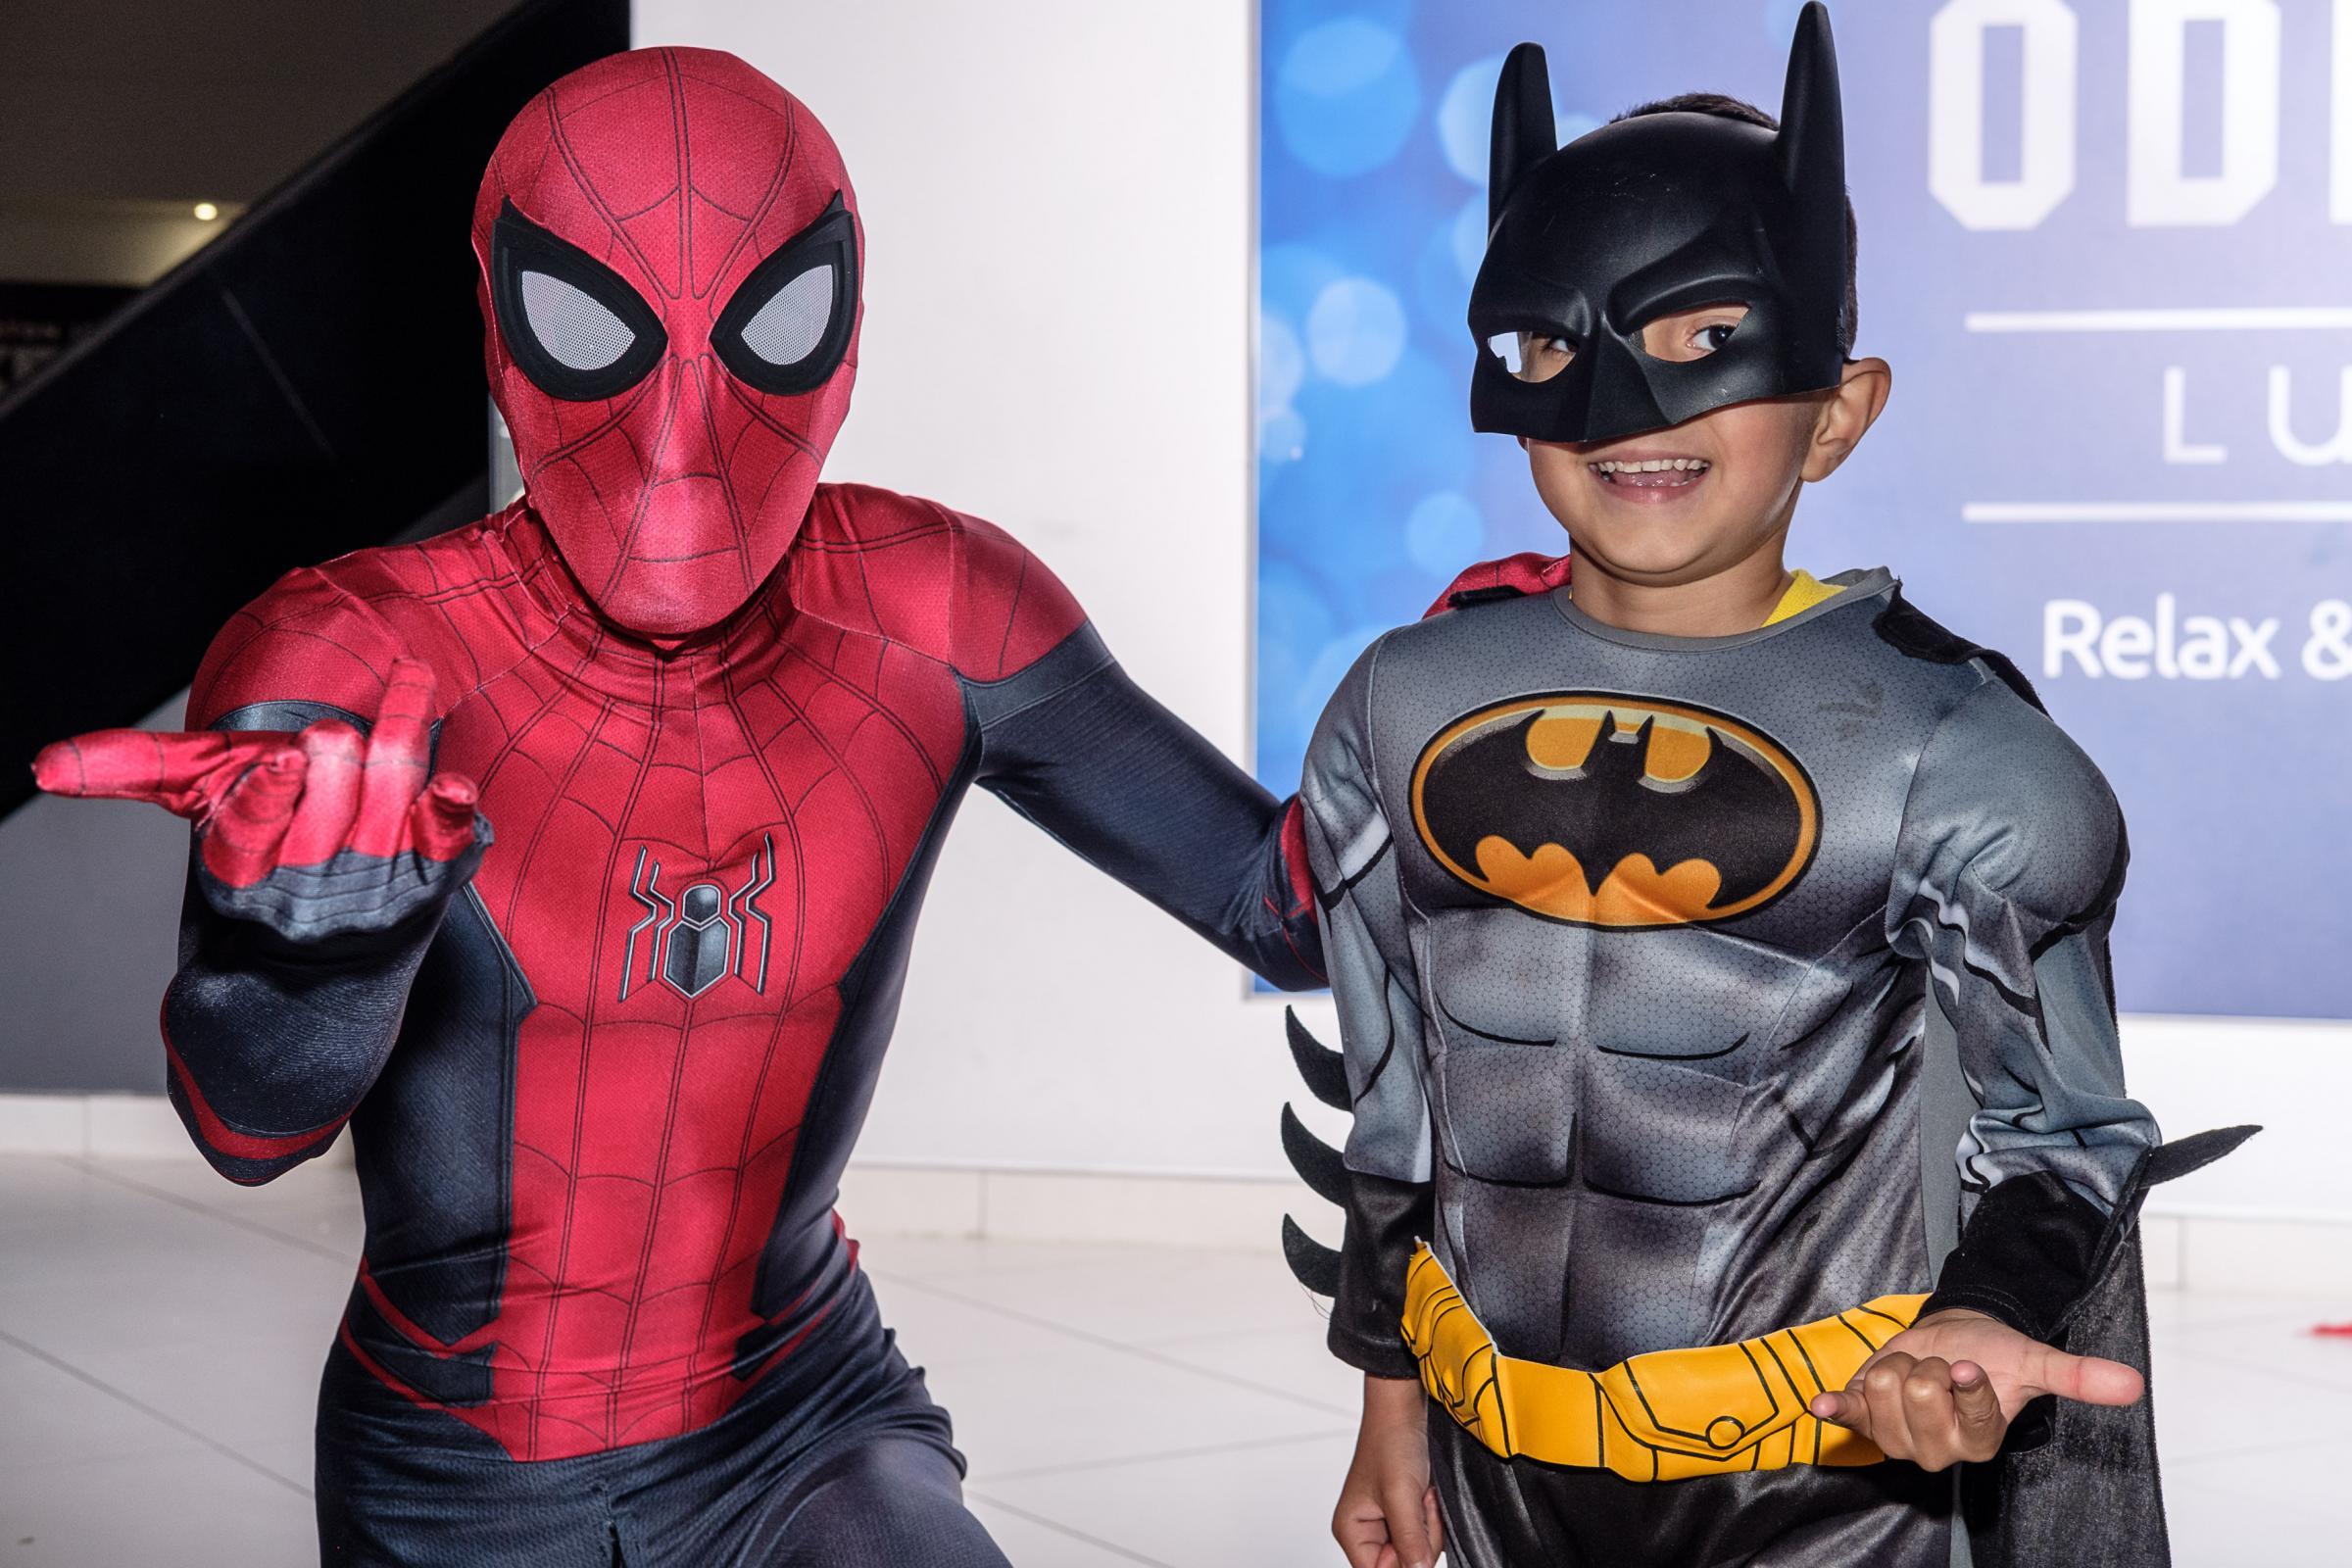 Superhero Day for Mind held at Odeon cinema, Thornbury